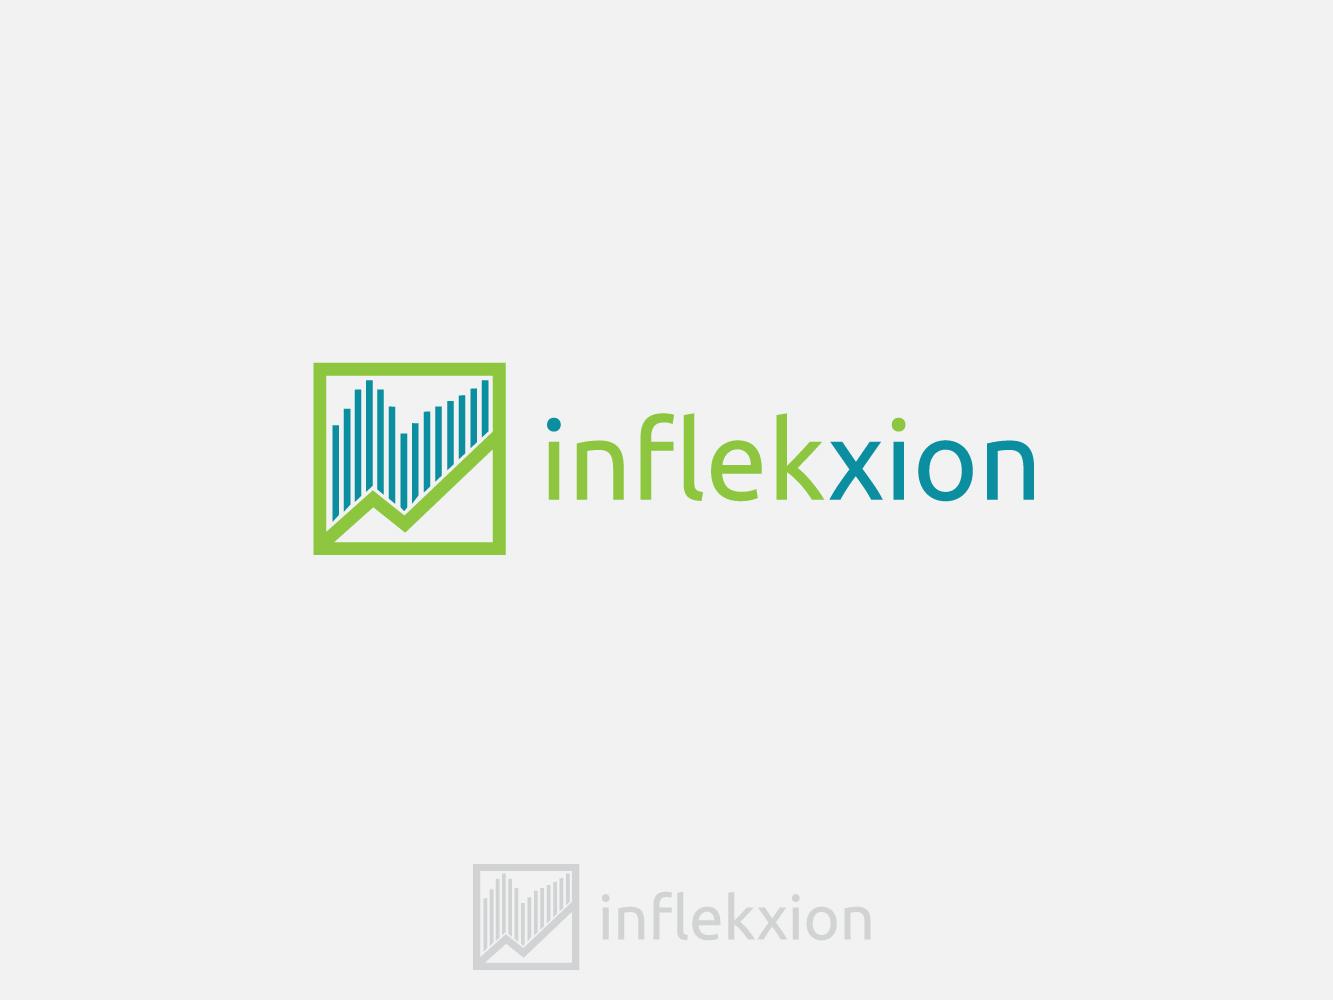 Logo Design by Jerameel Cabautan - Entry No. 38 in the Logo Design Contest Professional Logo Design for Inflekxion.